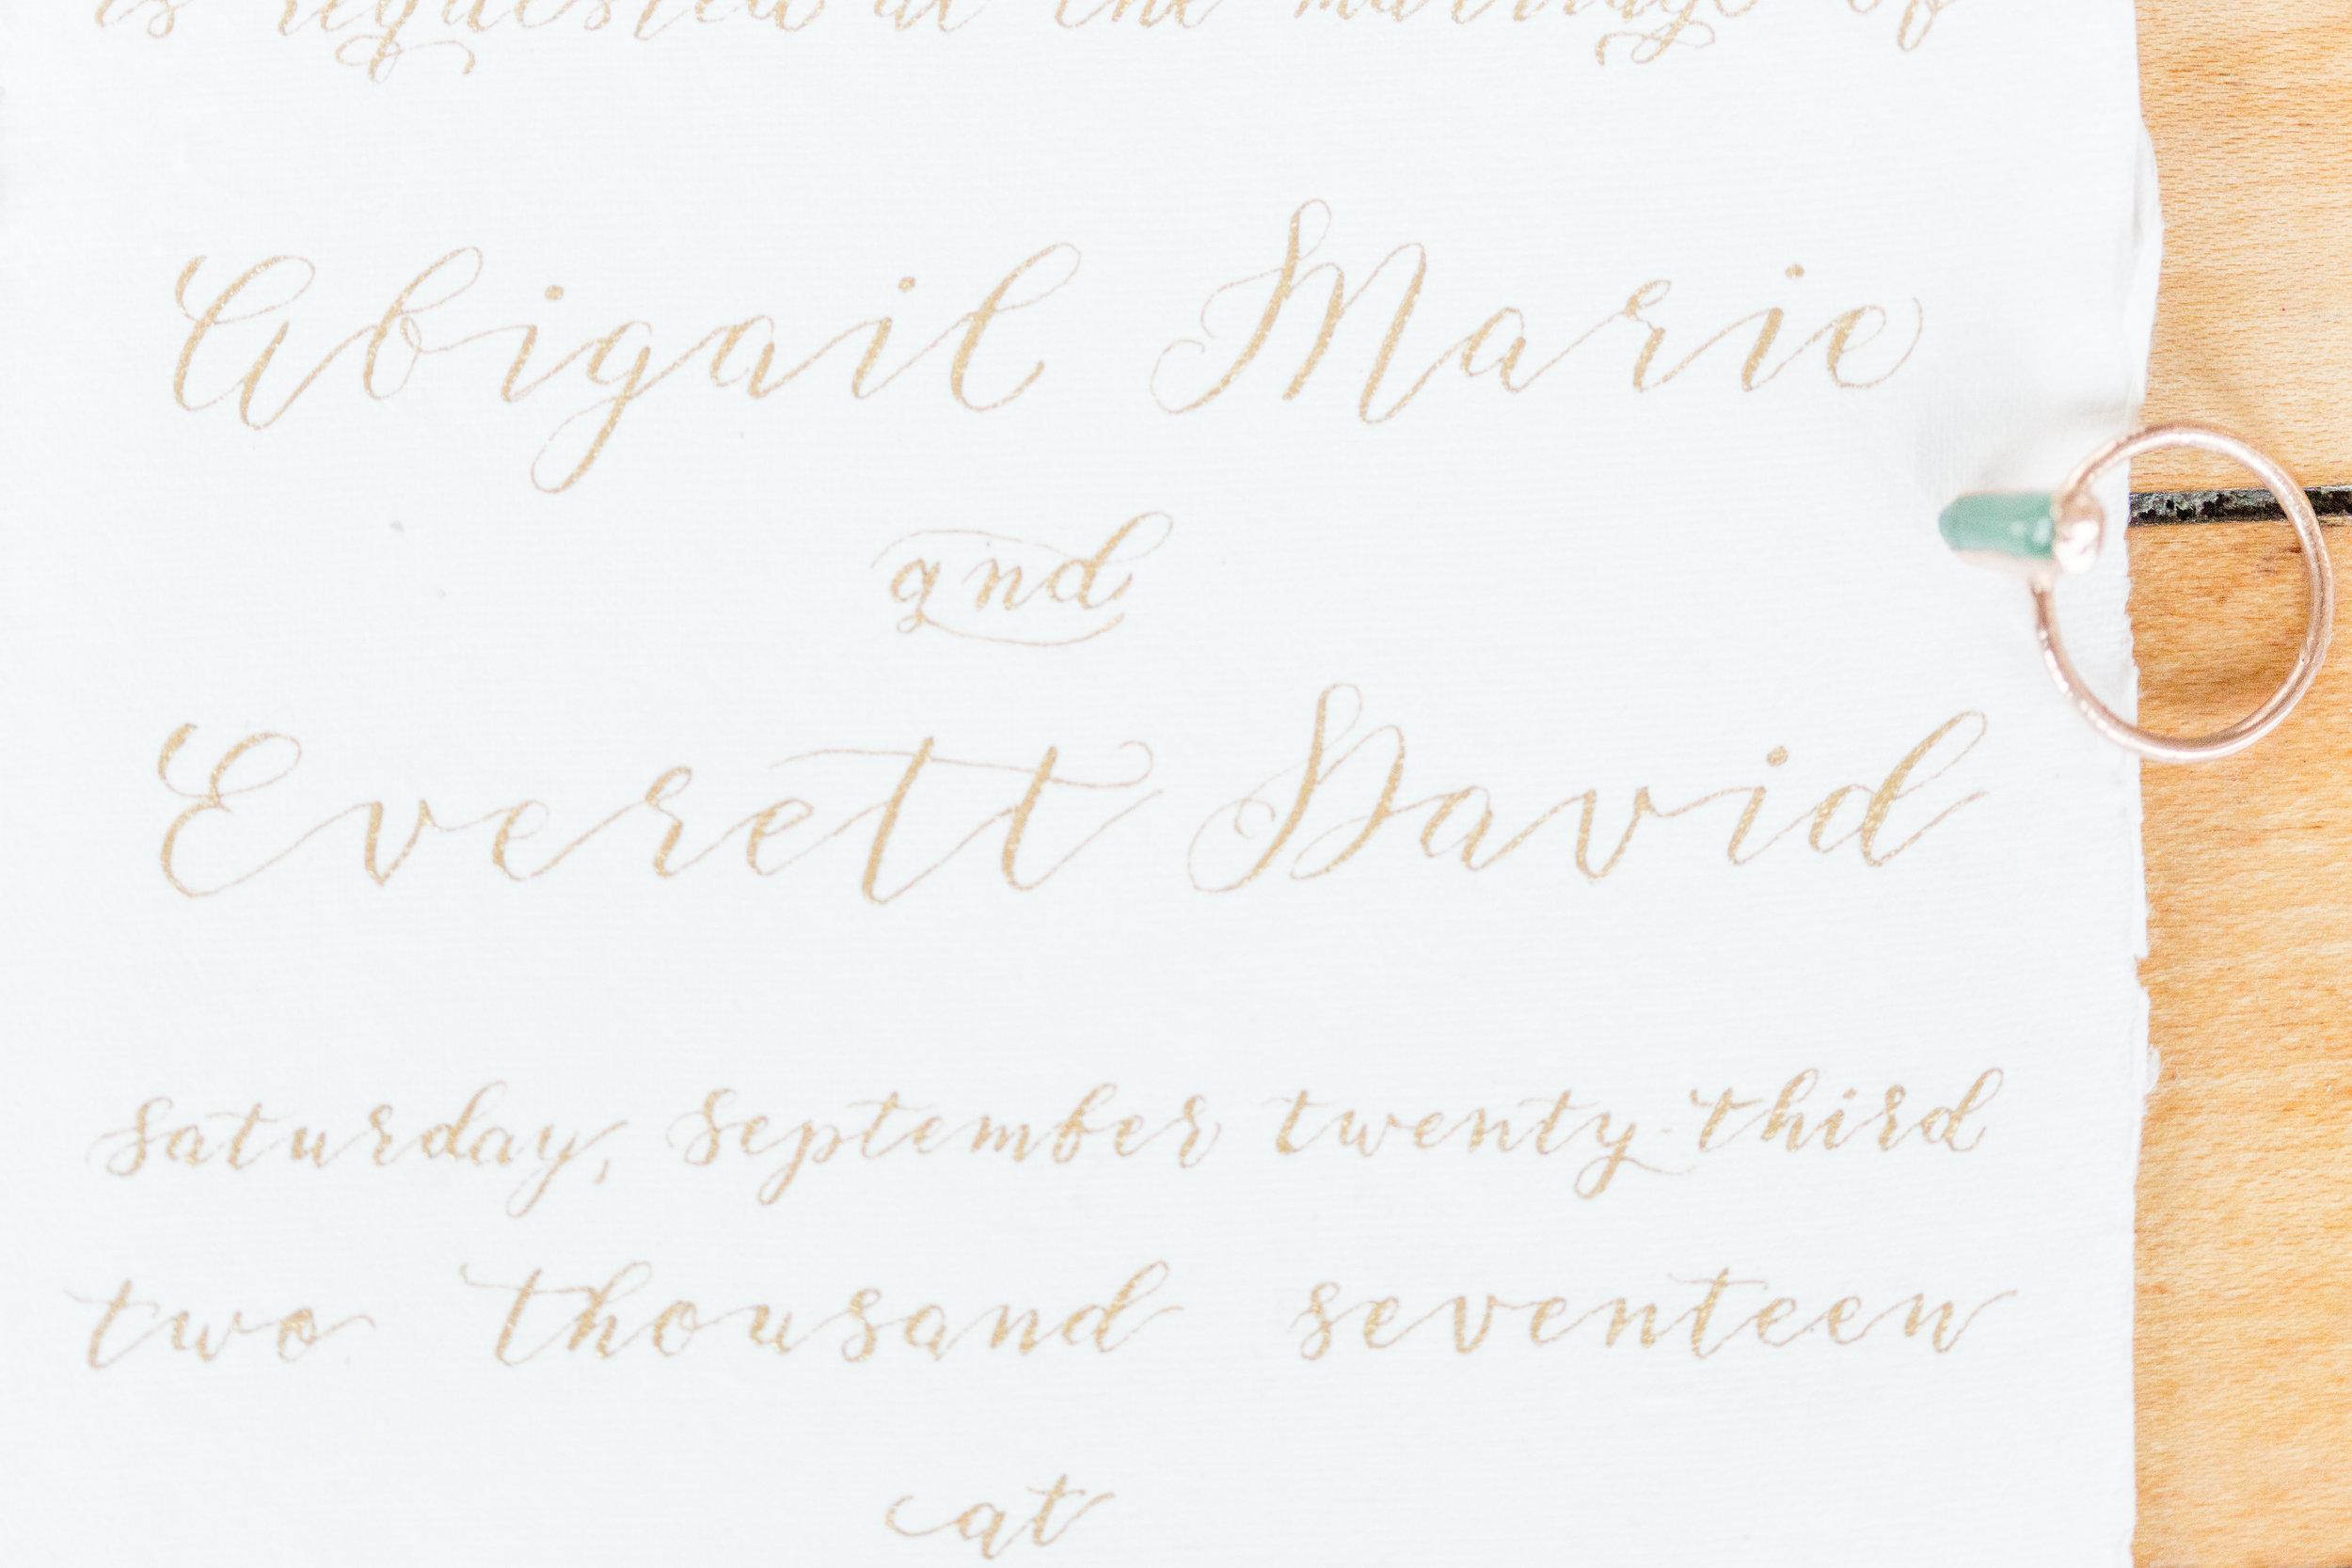 Central PA, York PA, JesSmith Designs, custom, wedding, invitations, bridal, announcements, save the date, birth, baby, motherhood, hanover, calligraphy, handlettering_044.jpg